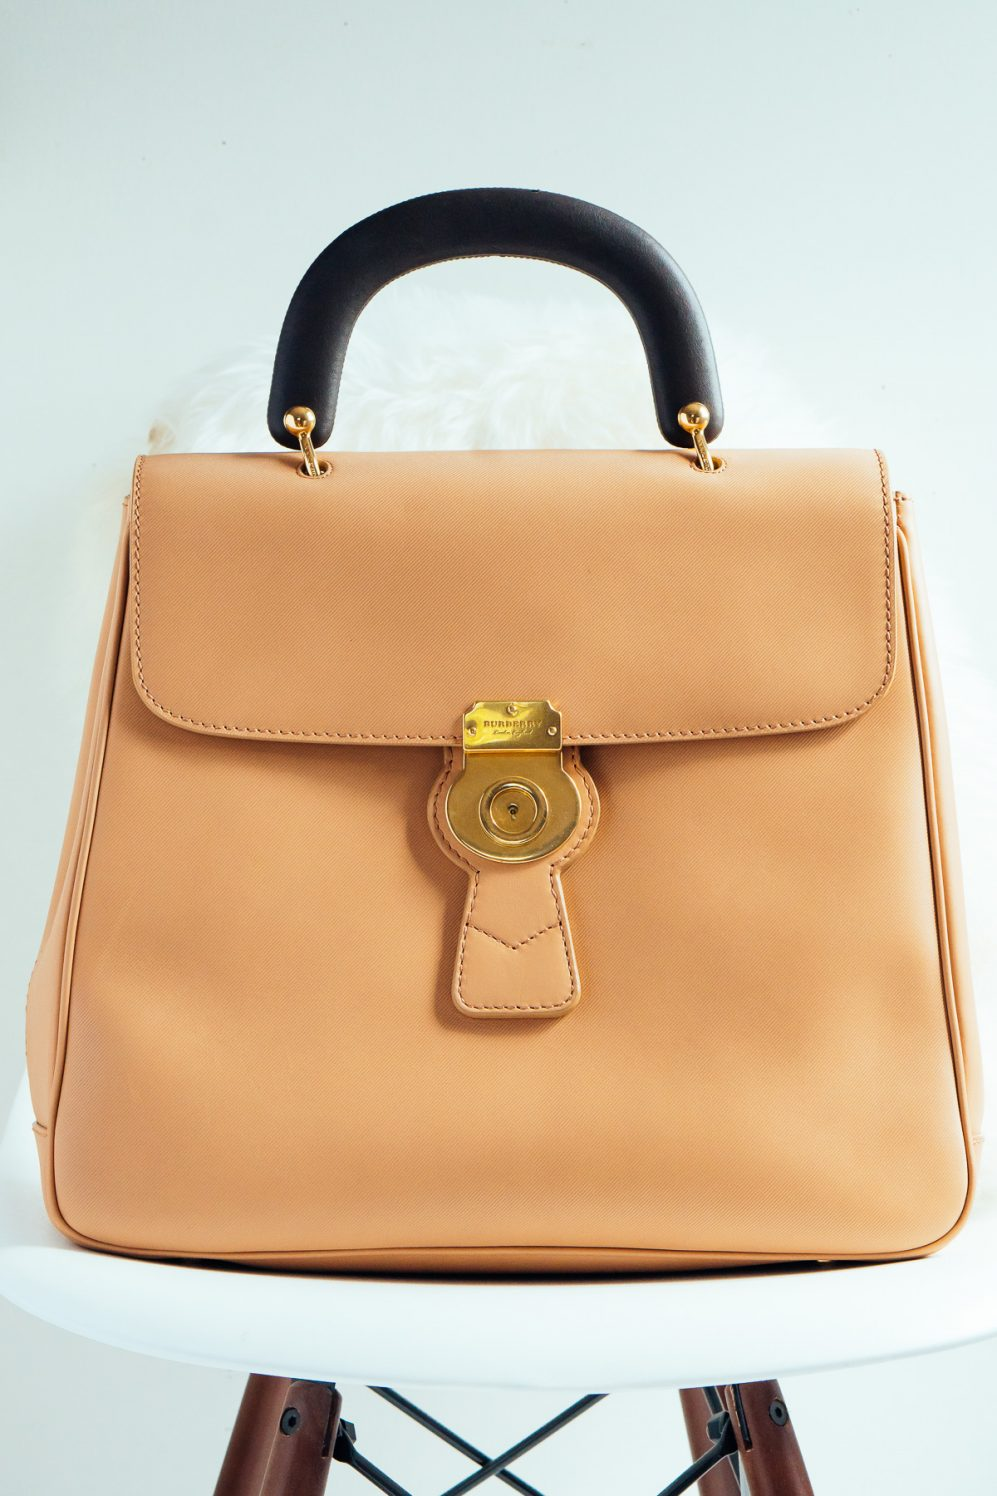 Burberry DK88 Bag Large